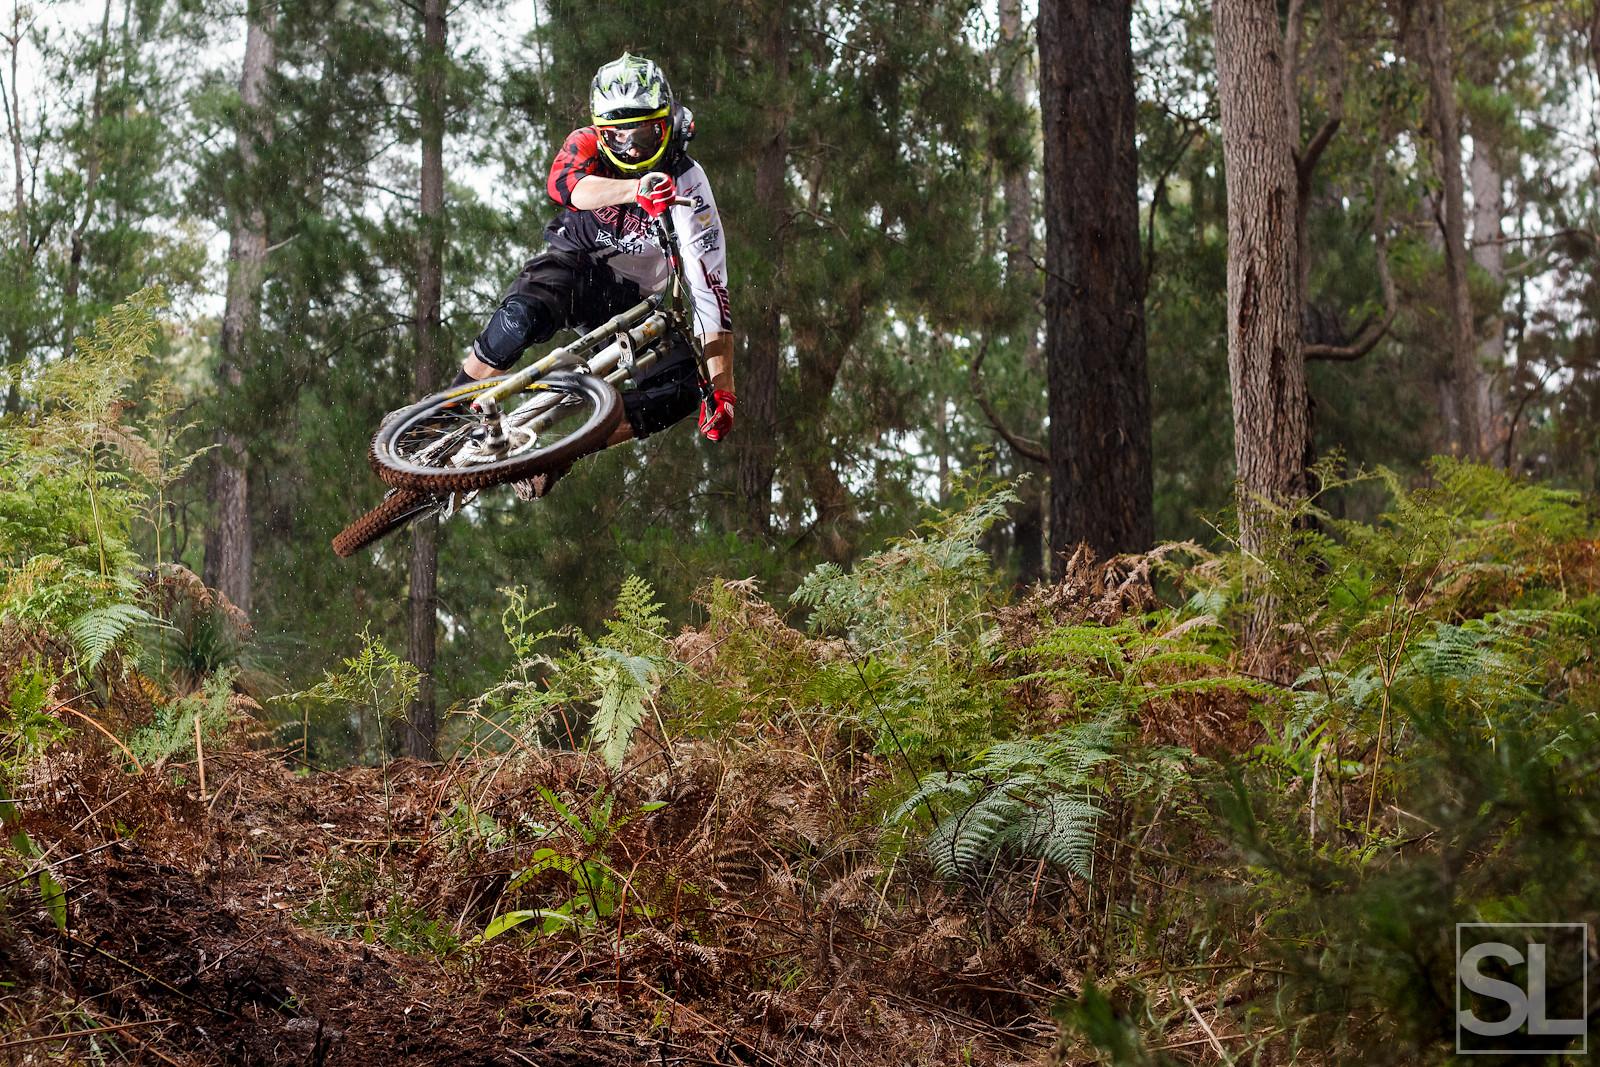 scrubs - Chamakazi - Mountain Biking Pictures - Vital MTB